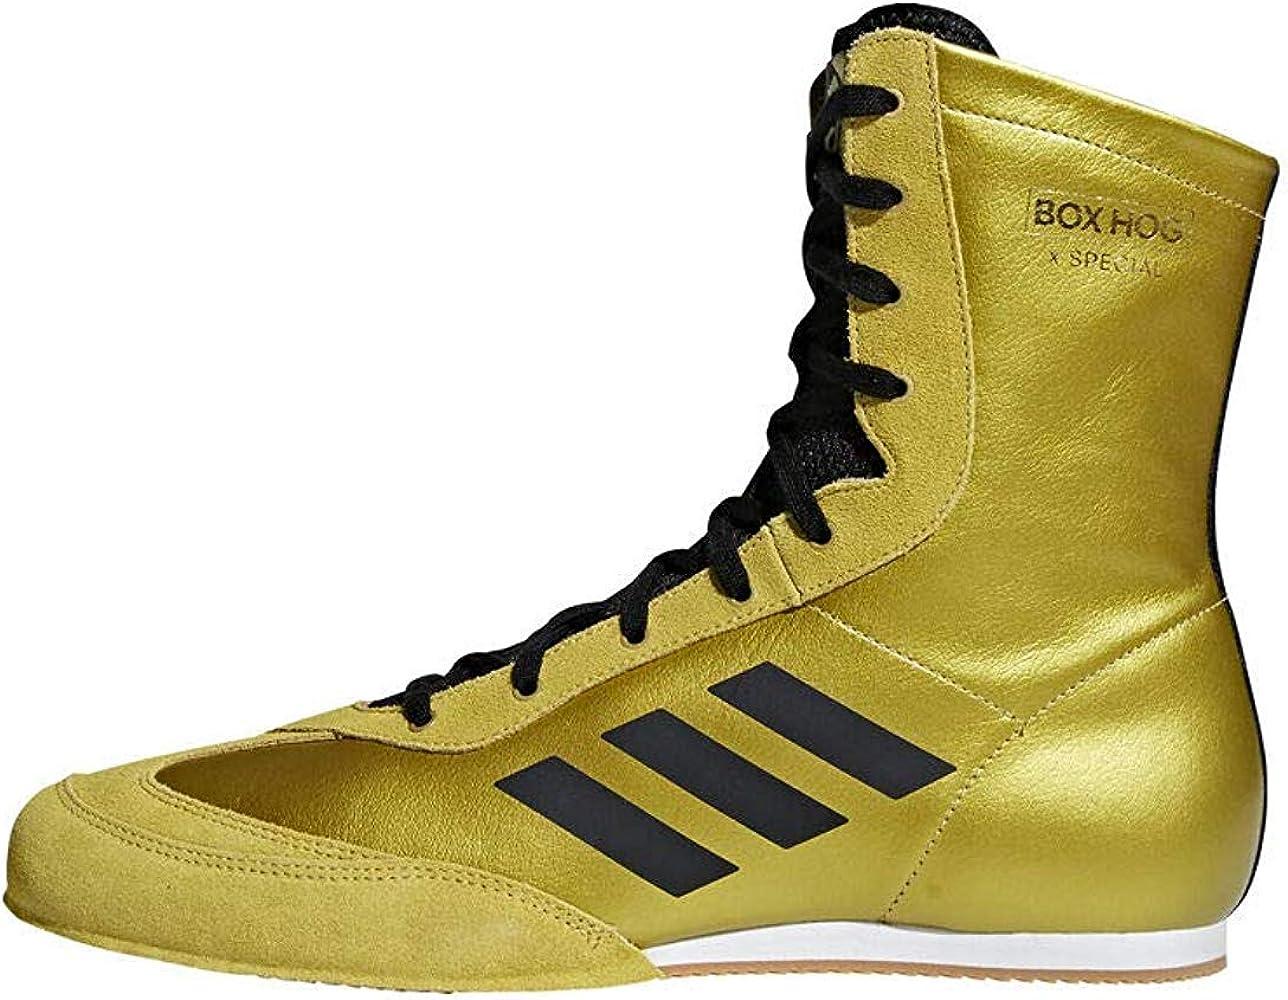 adidas Box Hog x Special Shoes